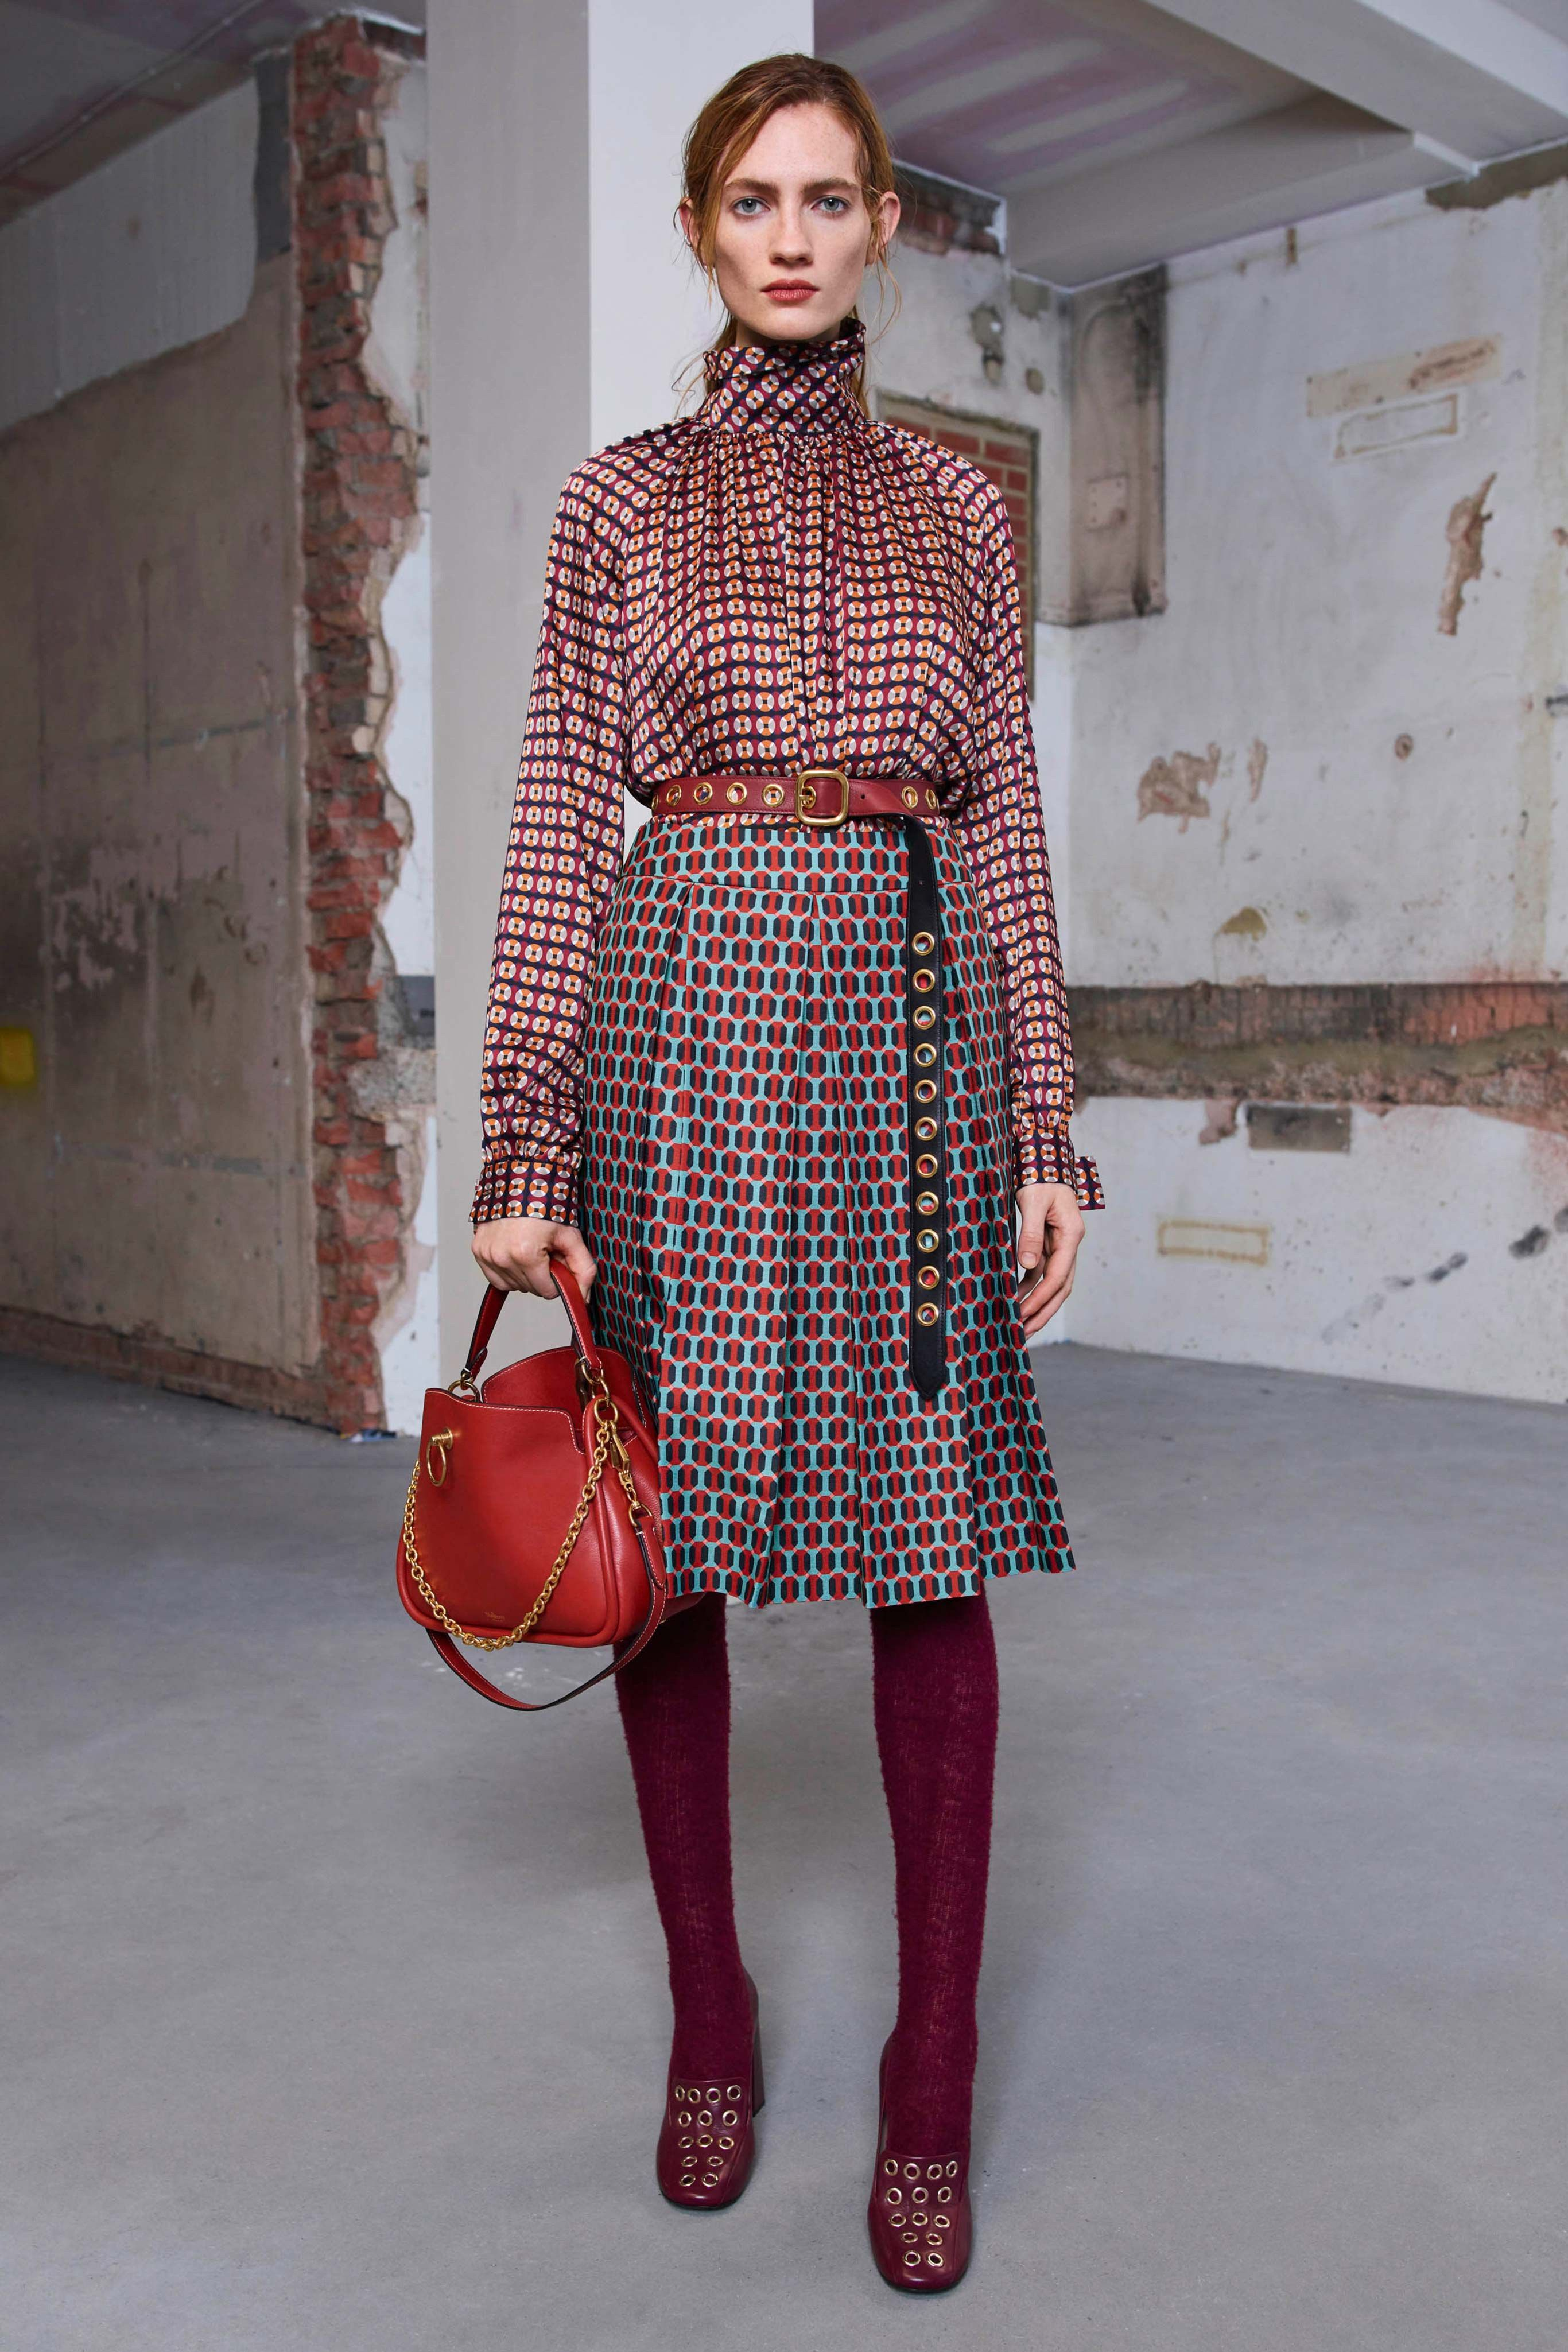 Mulberry Fall 2019 Ready-to-Wear Fashion Show #2019fallfashiontrends